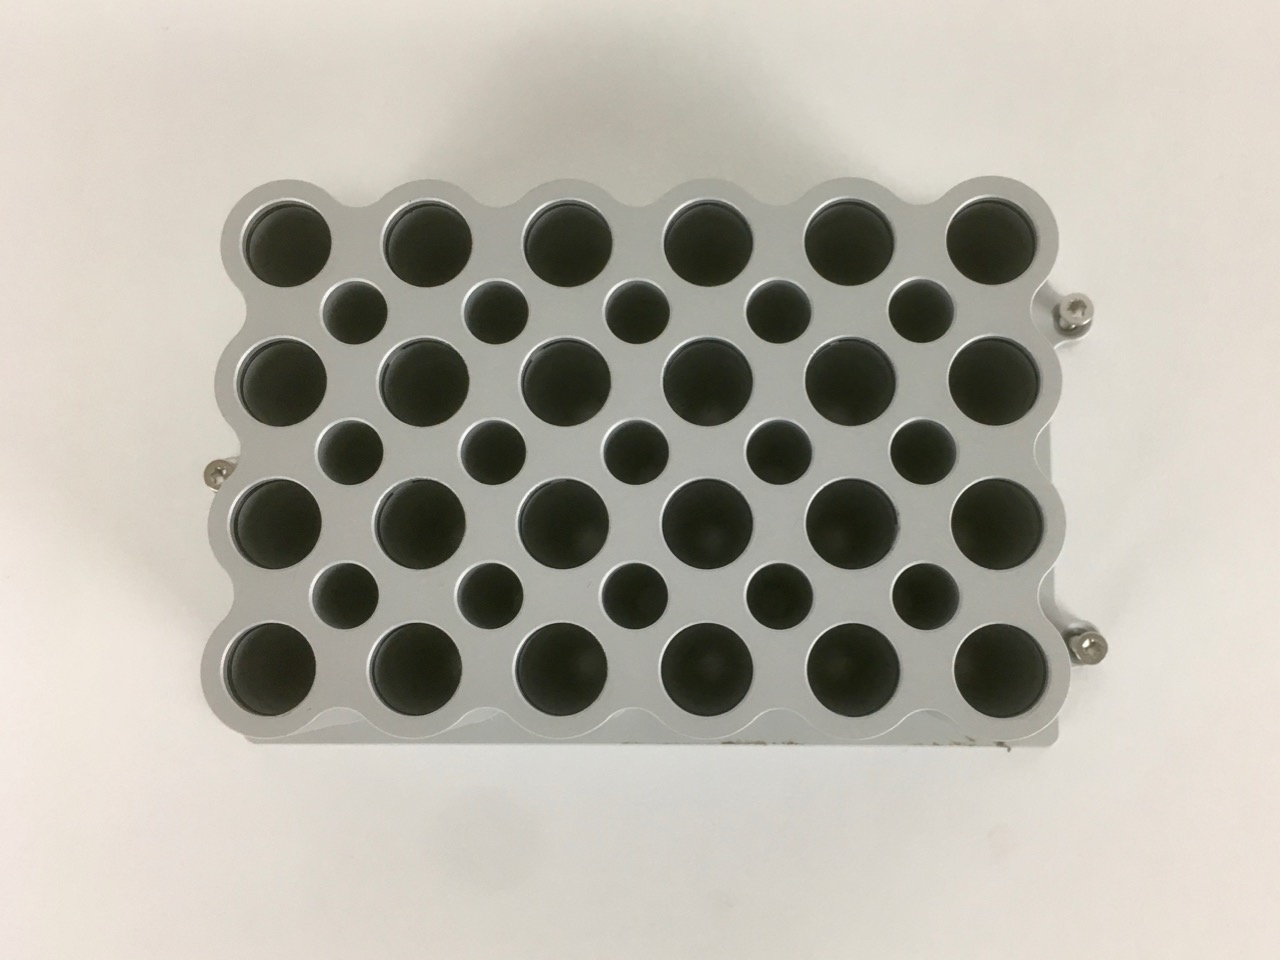 qinstruments Qinstruments Adapter for 24/2.0ml tubes